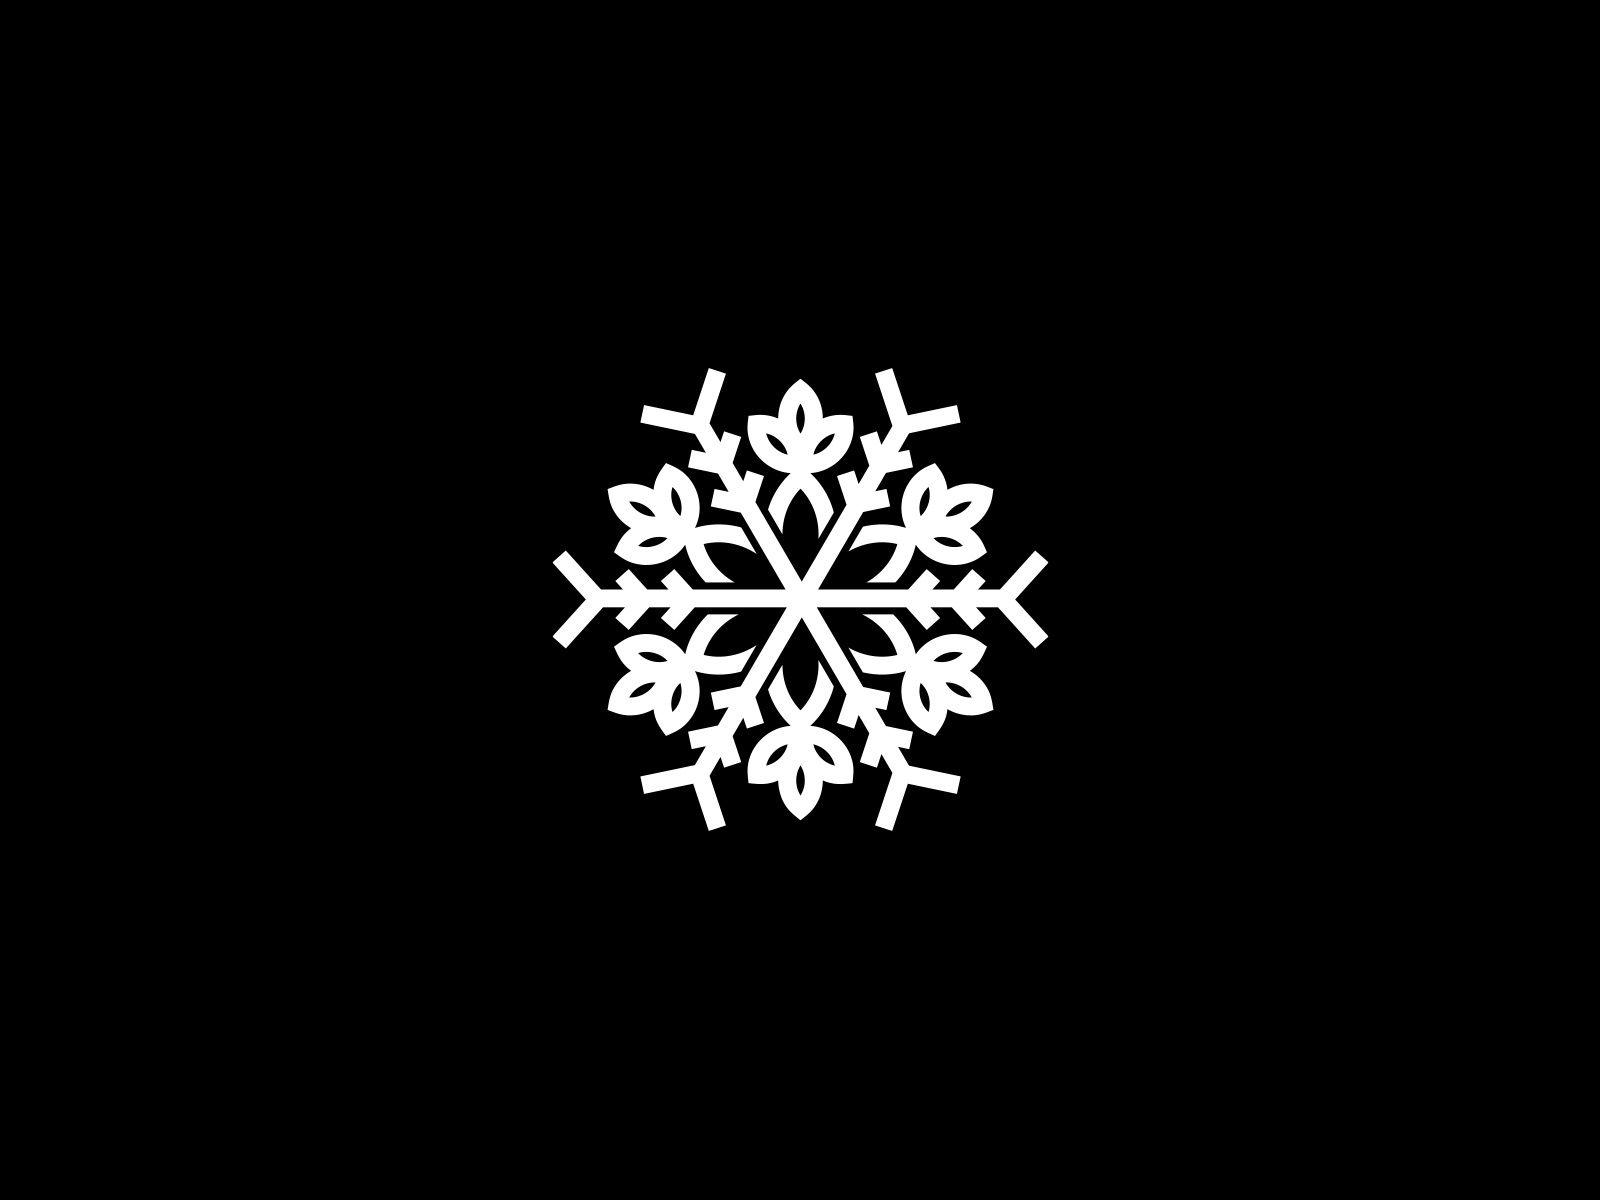 Neat Snow Logo Snowflake Flower Flower Symbol Cool Logo Elegant Snowflake